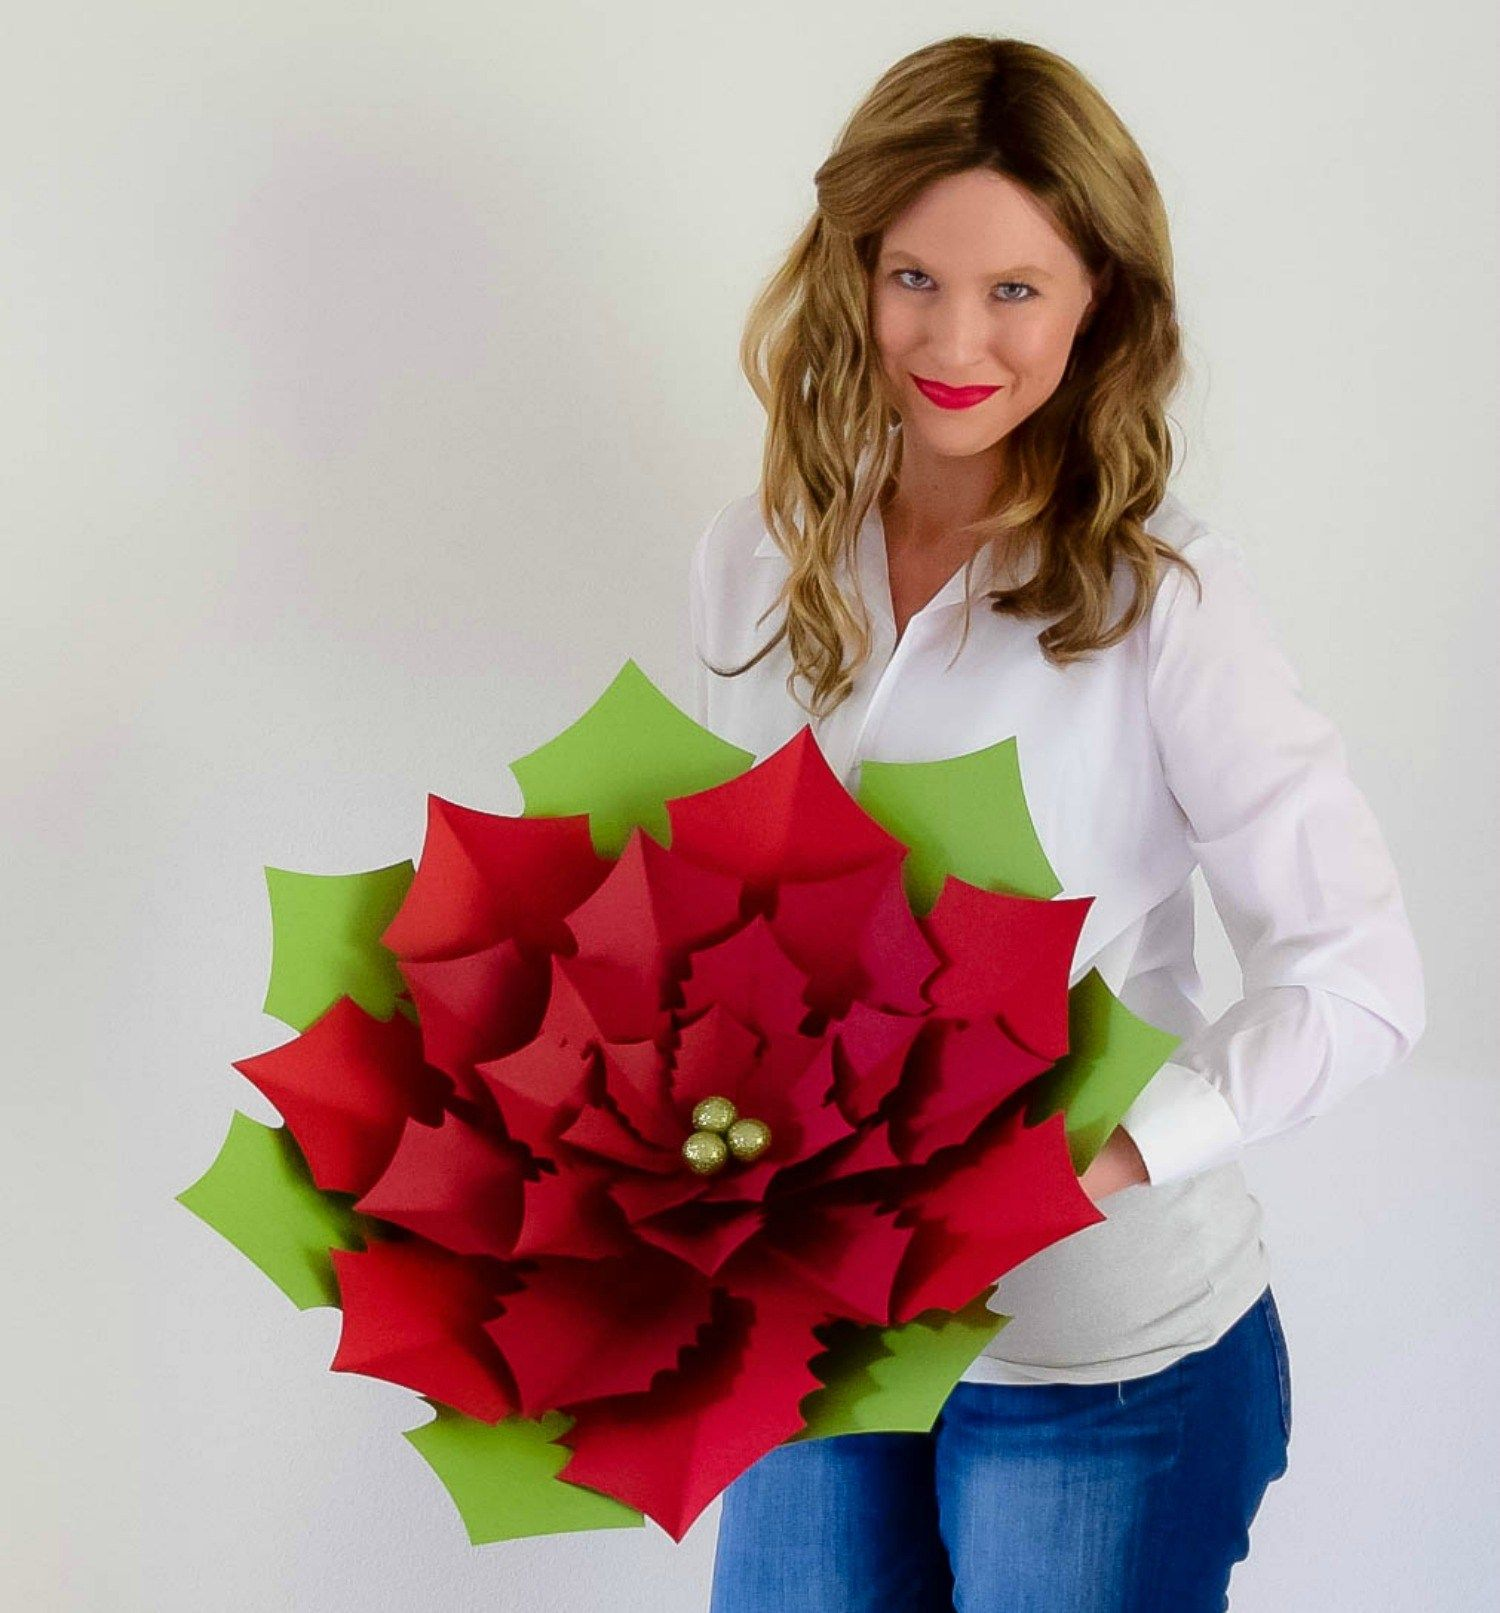 Diy Giant Paper Poinsettia Tutorial Christmas Paper Poinsettias